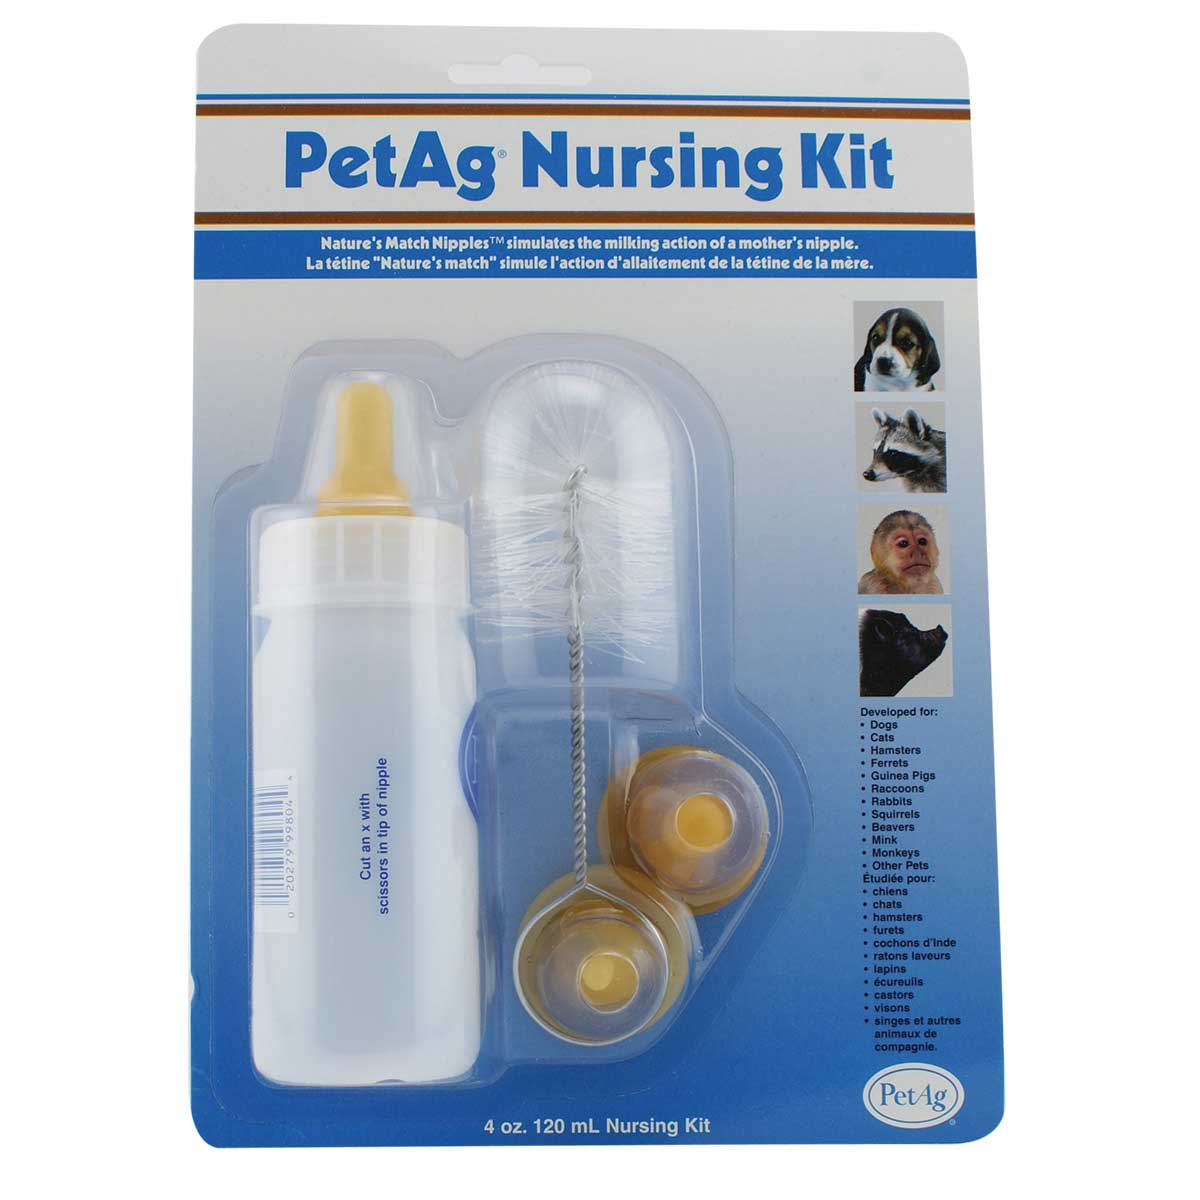 PetAg Nursing Kit 2 oz